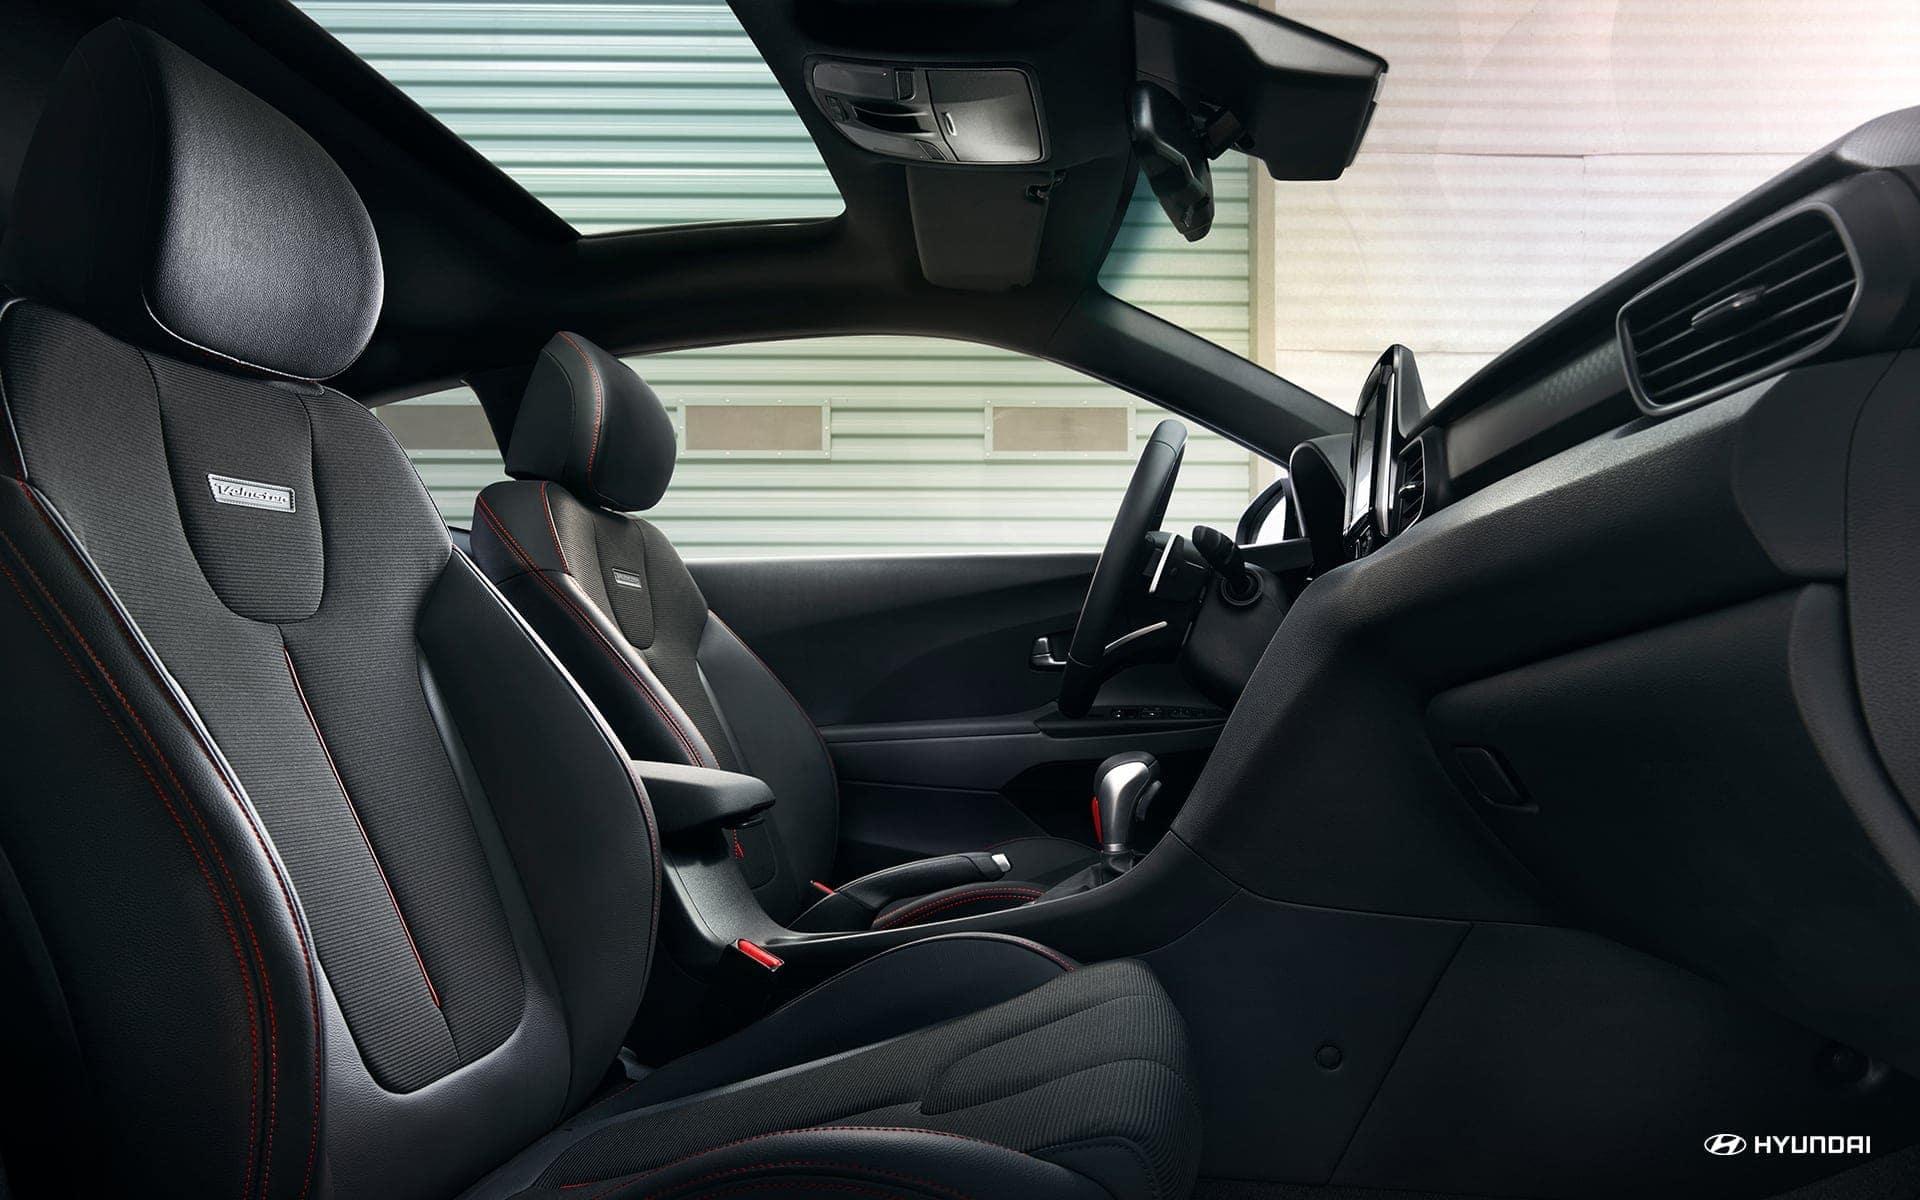 Explore the Hyundai Veloster N at Family Hyundai